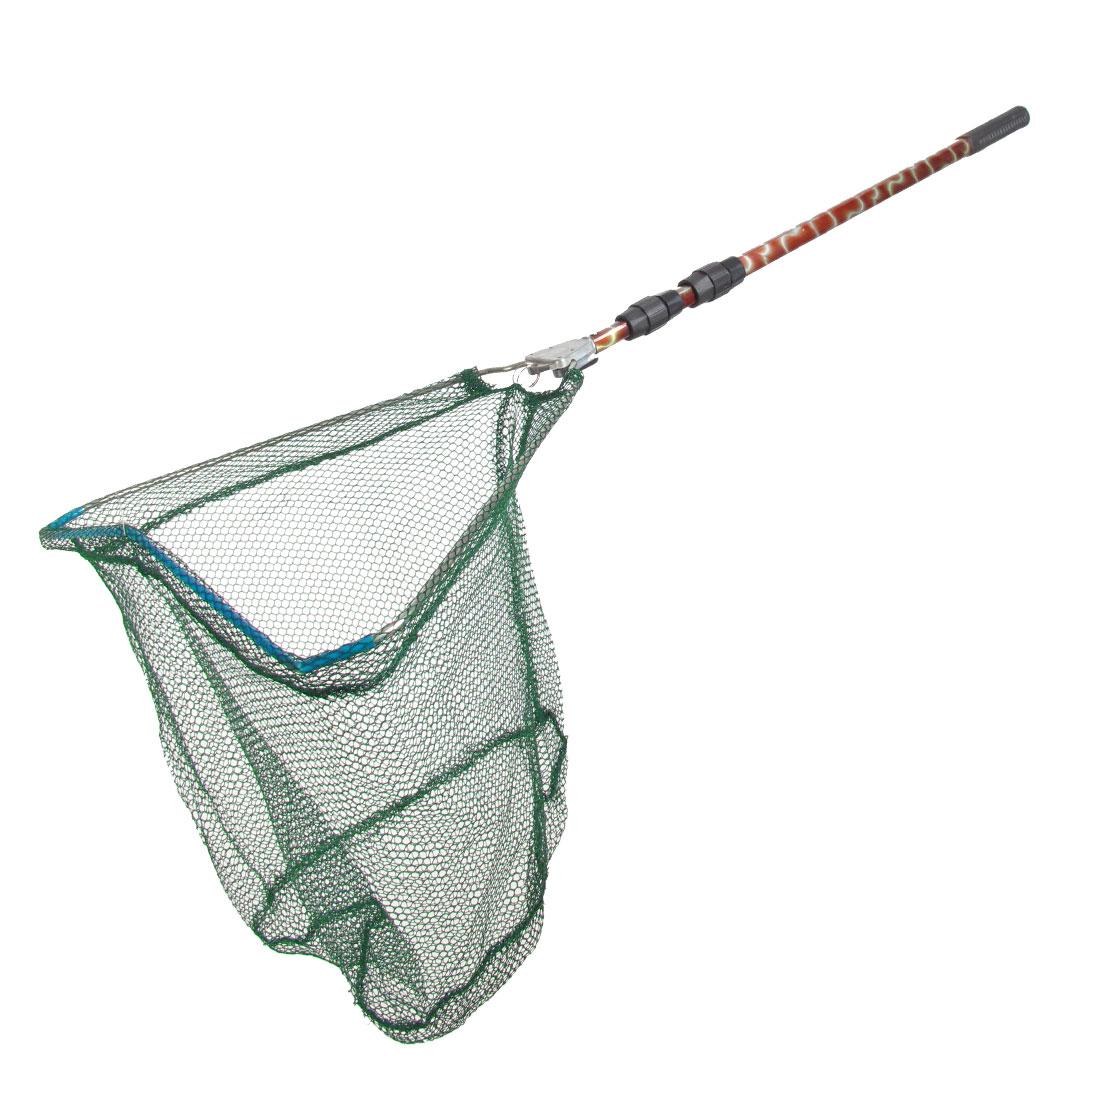 1.4M Length Telescopic Handle Green Knotless Foldup Dipnet Fishing Landing Net